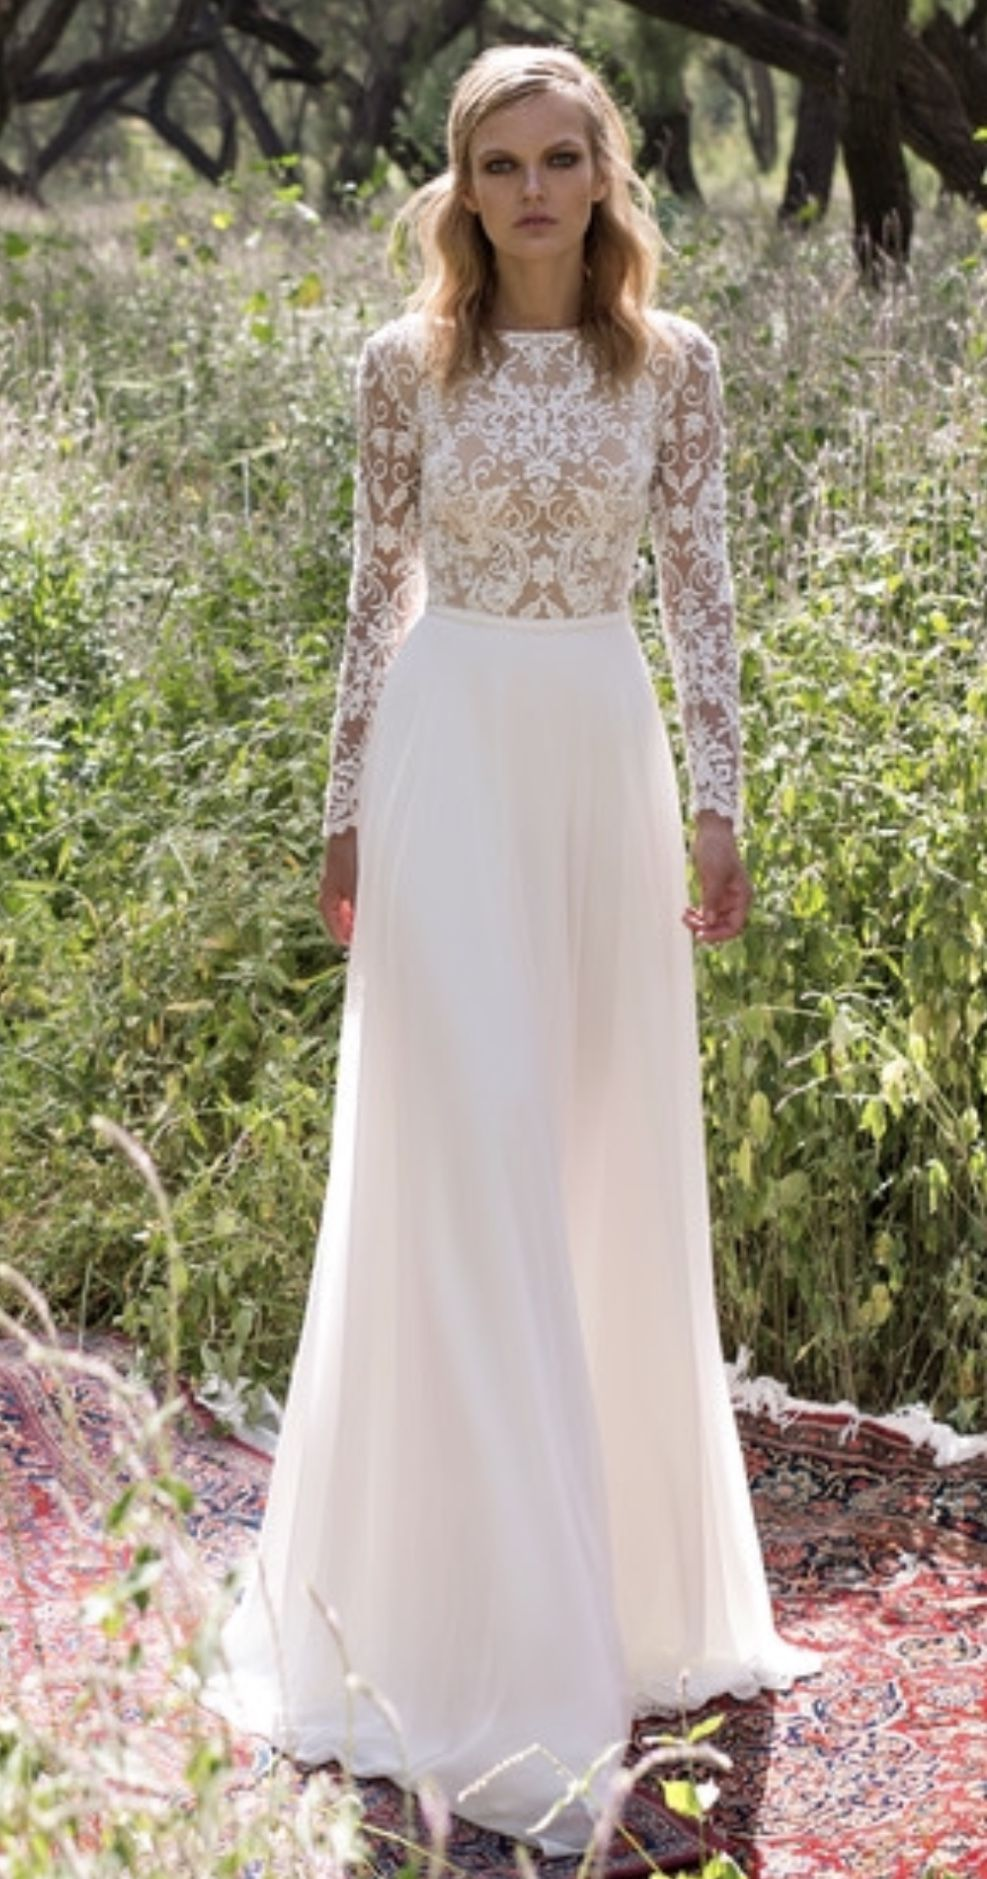 Limor Rosen Wedding Dresses Lace Wedding Dress Long Sleeve Destination Wedding Dress